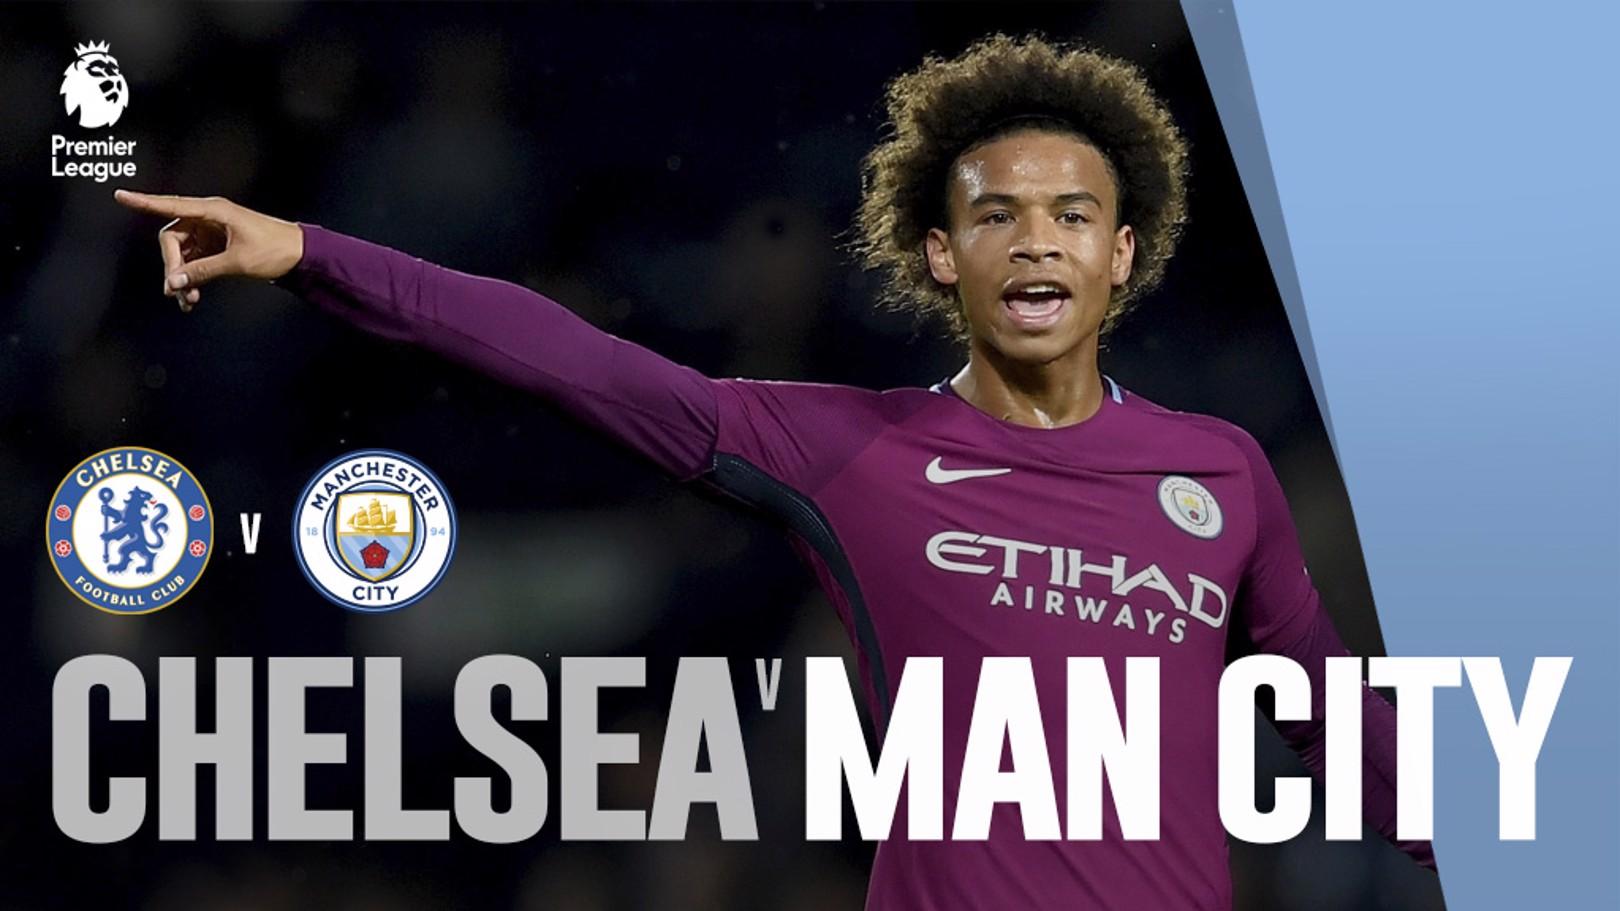 Chelsea vs City: En direct!